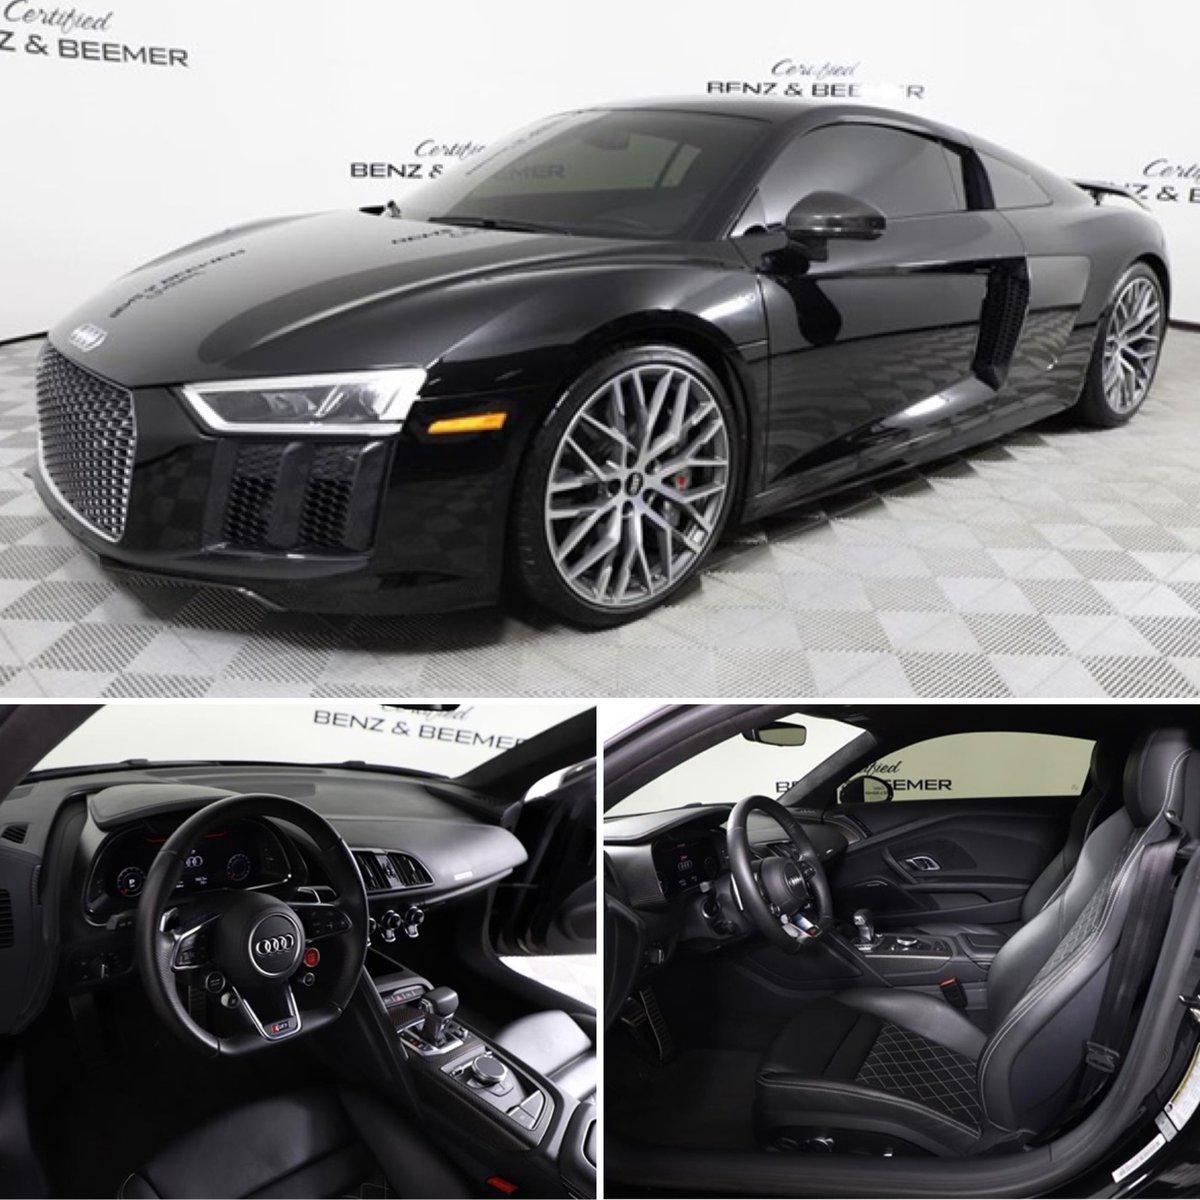 "FOR SALE - 2017 Audi R8 5.2 Plus, diamond stitched leather, Bang & Olufsen audio pkg, 20"" wheel pkg, carbon fiber interior & exterior pkgs. $136,000  • Call Certified Benz & Beemer (844) 568-1362 Stock 15671 or see http://www.Highline-Autos.com to shop additional Audis #audi #audir8 pic.twitter.com/h9Hmu5ntqZ"